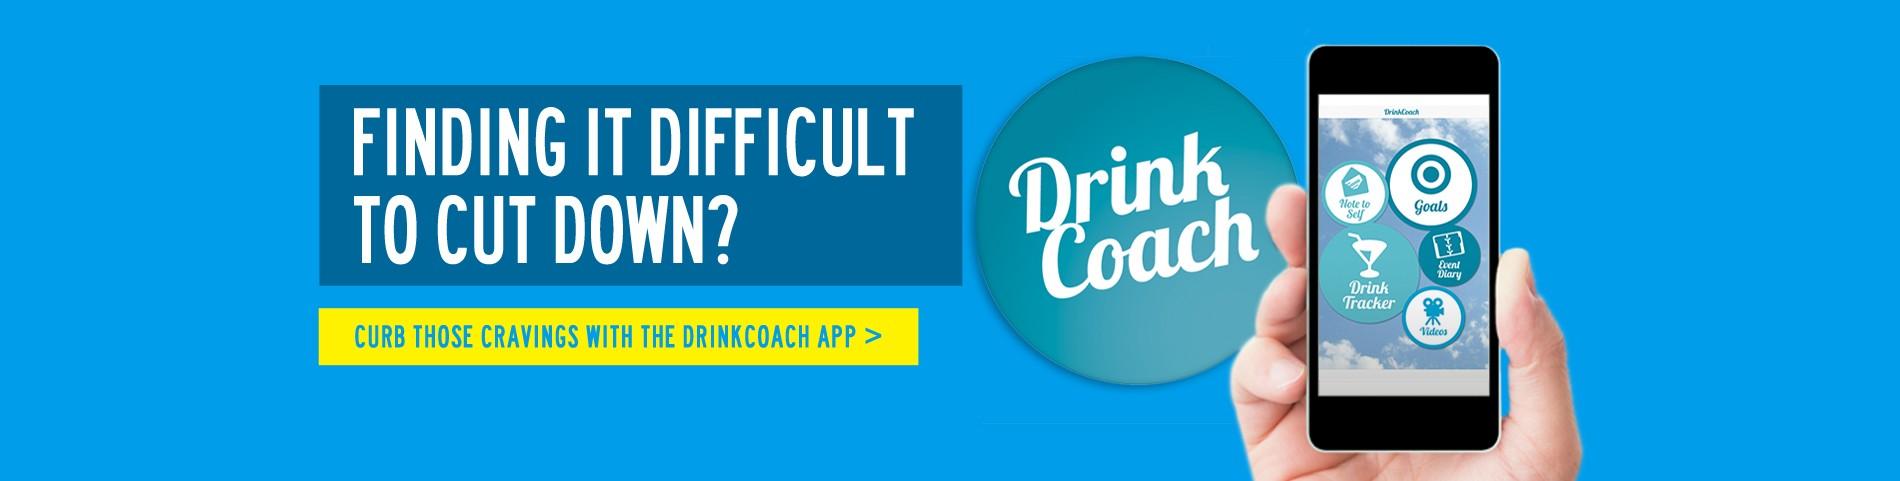 DrinkCoach